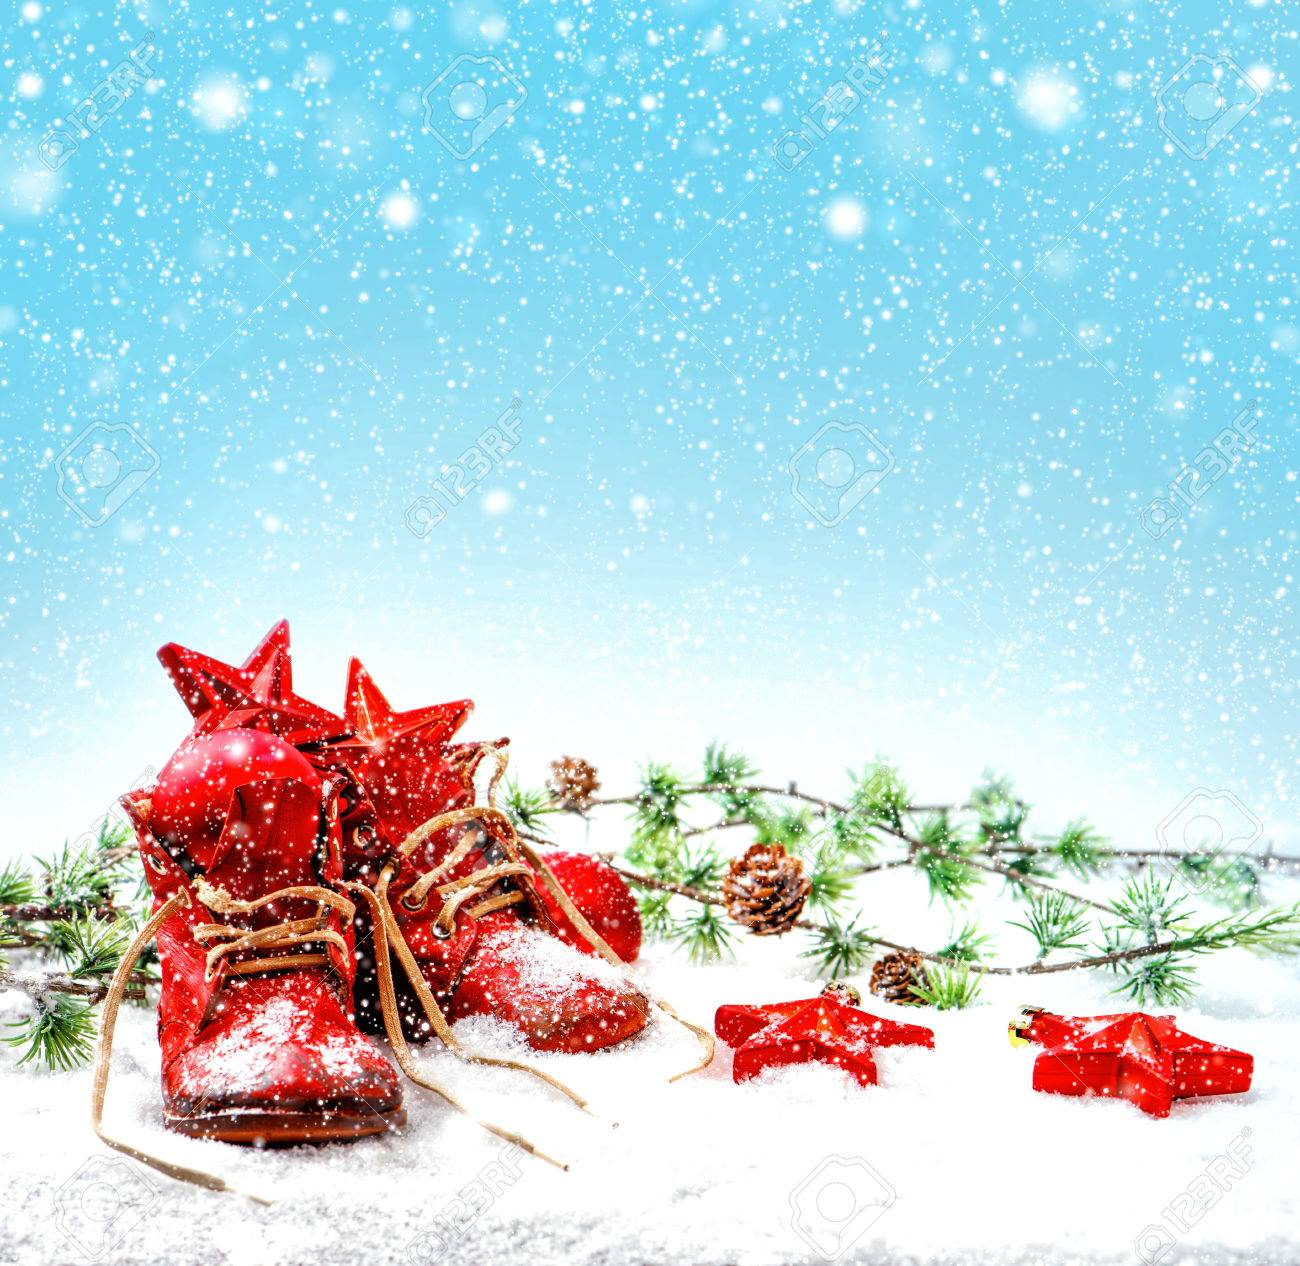 Nostalgic Christmas Decoration With Antique Baby Shoes. Retro ...